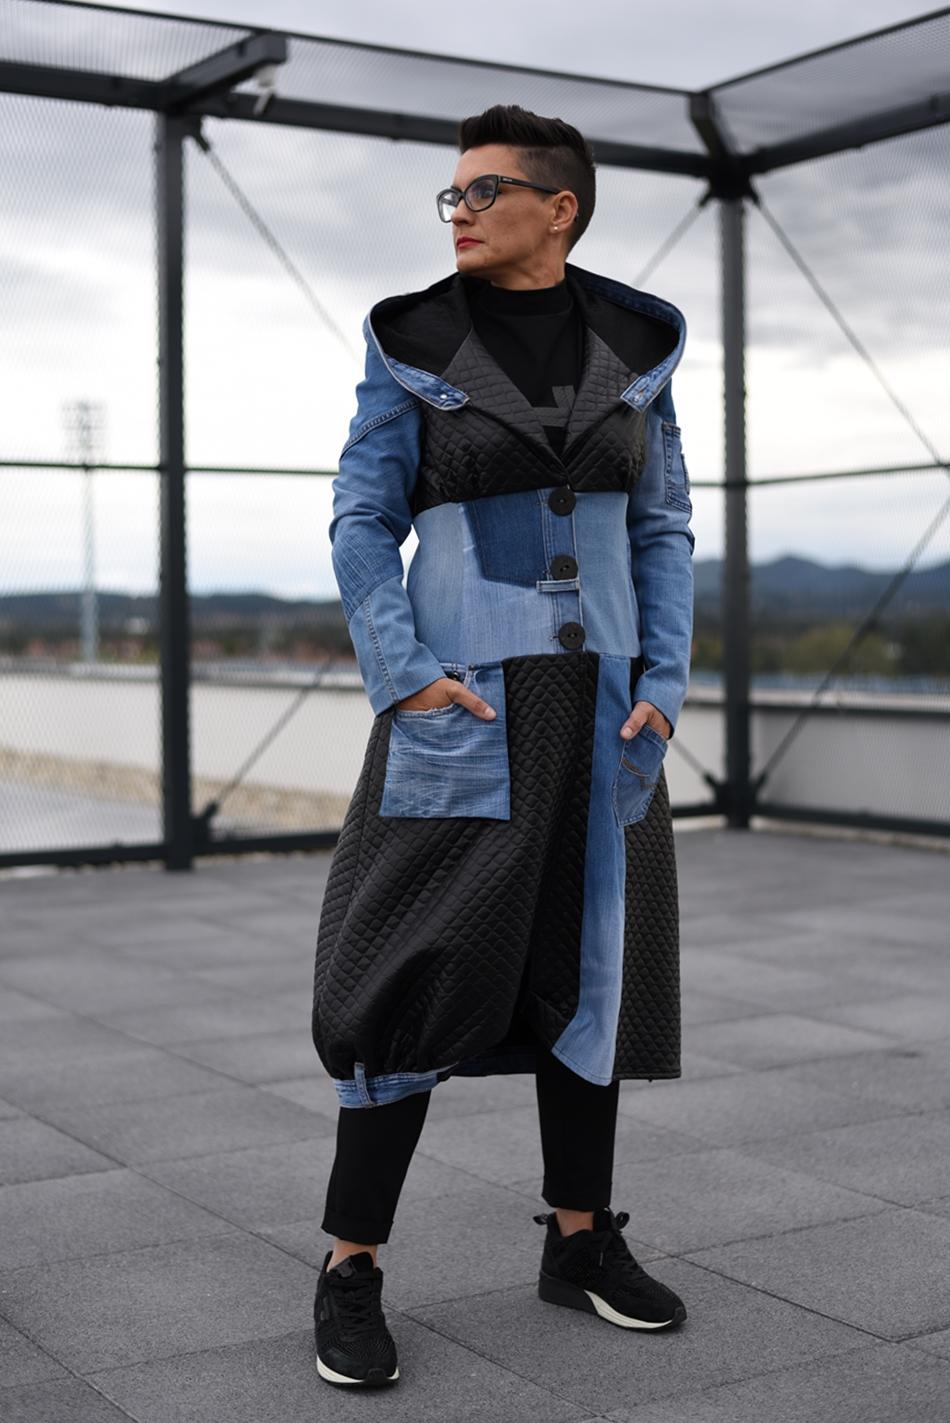 Broth_design_clothes_087